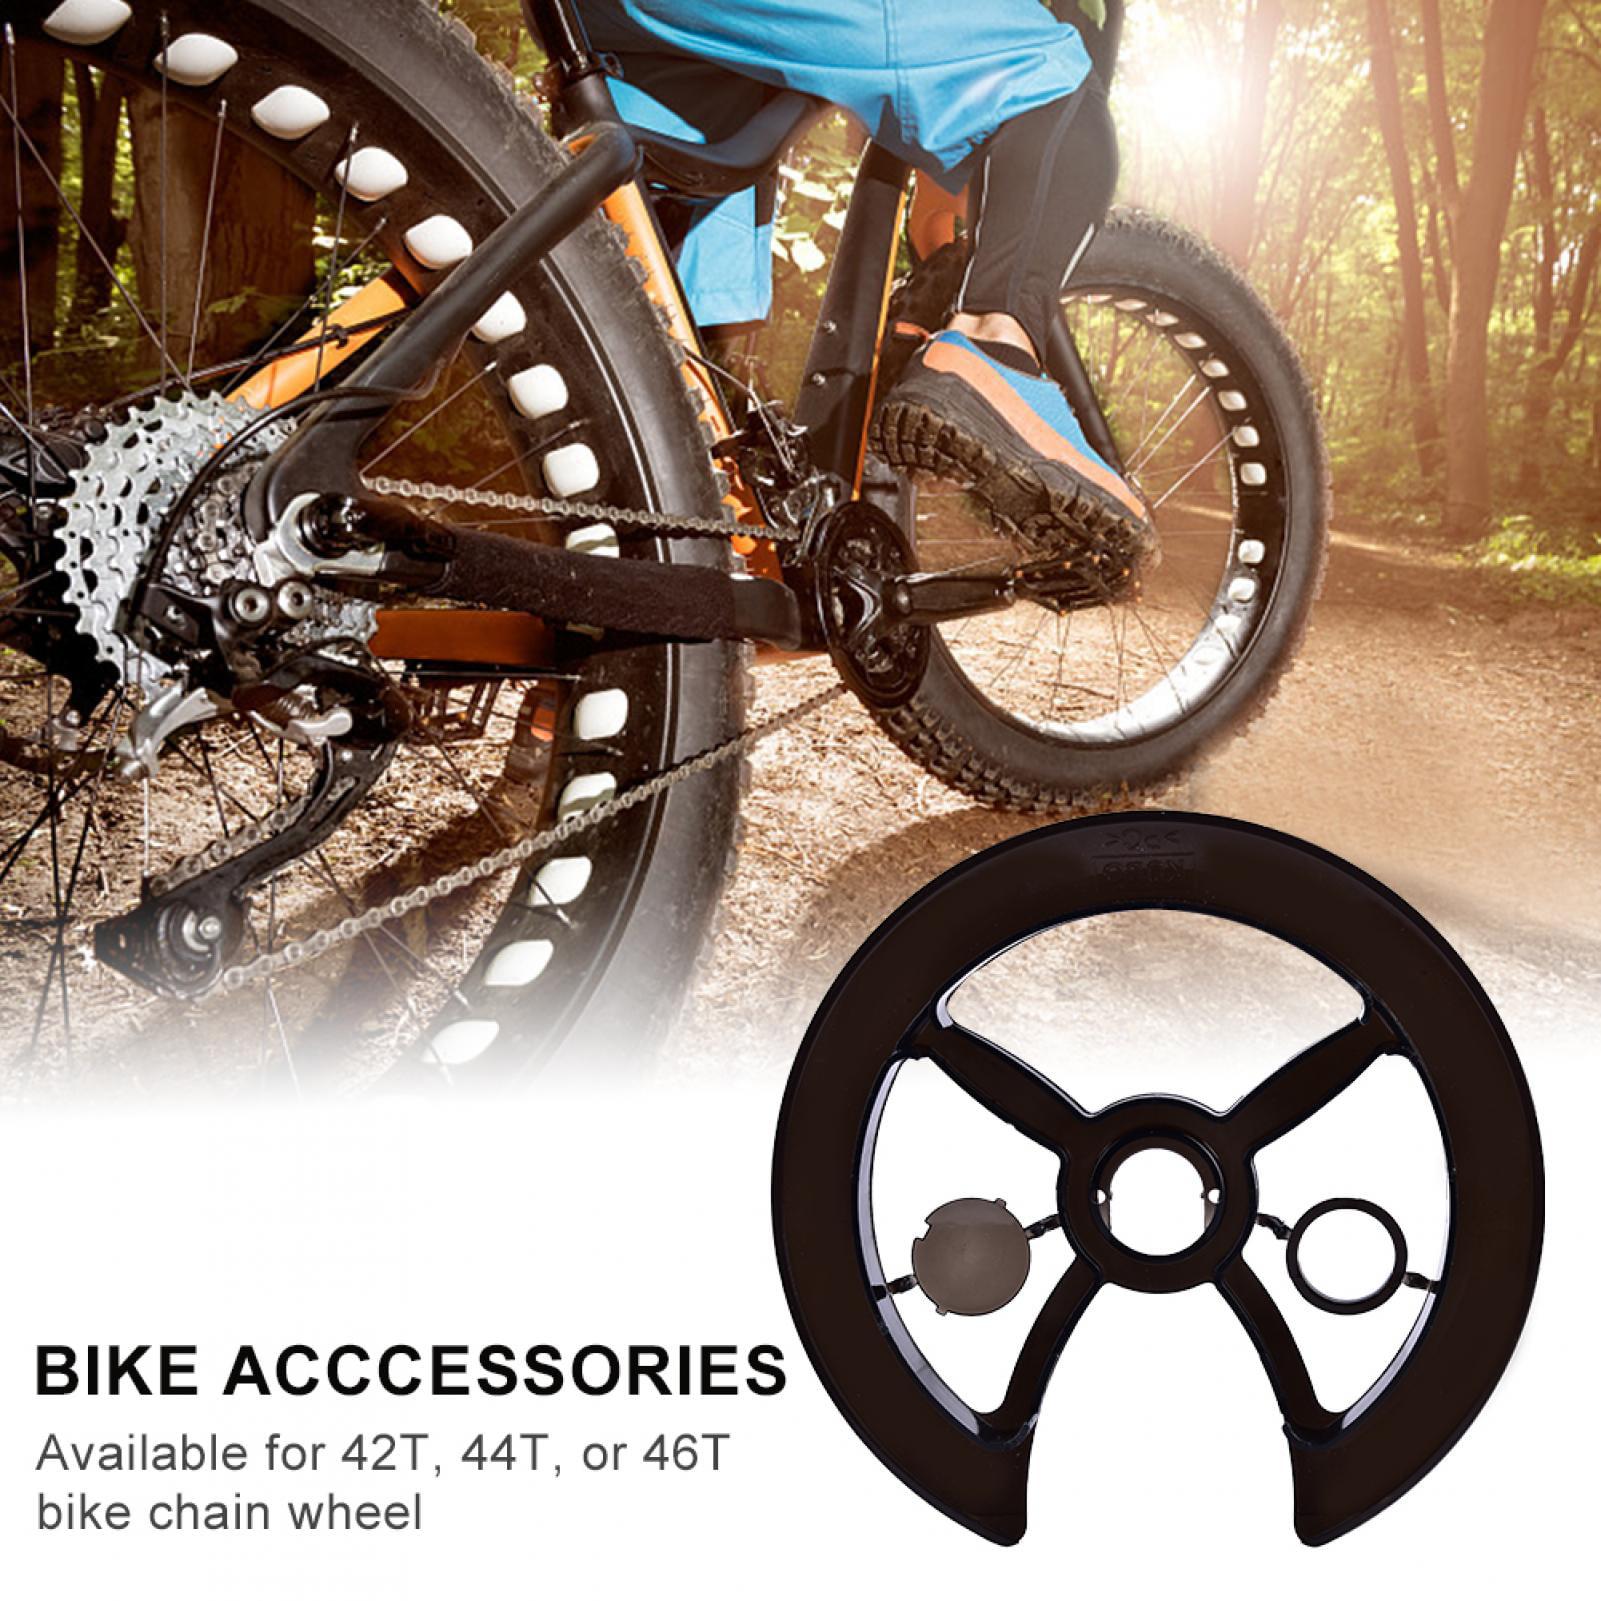 Bicycle Crankset Crank Guard Protector Bike Chain Wheel Ring Cover Accessori nh3